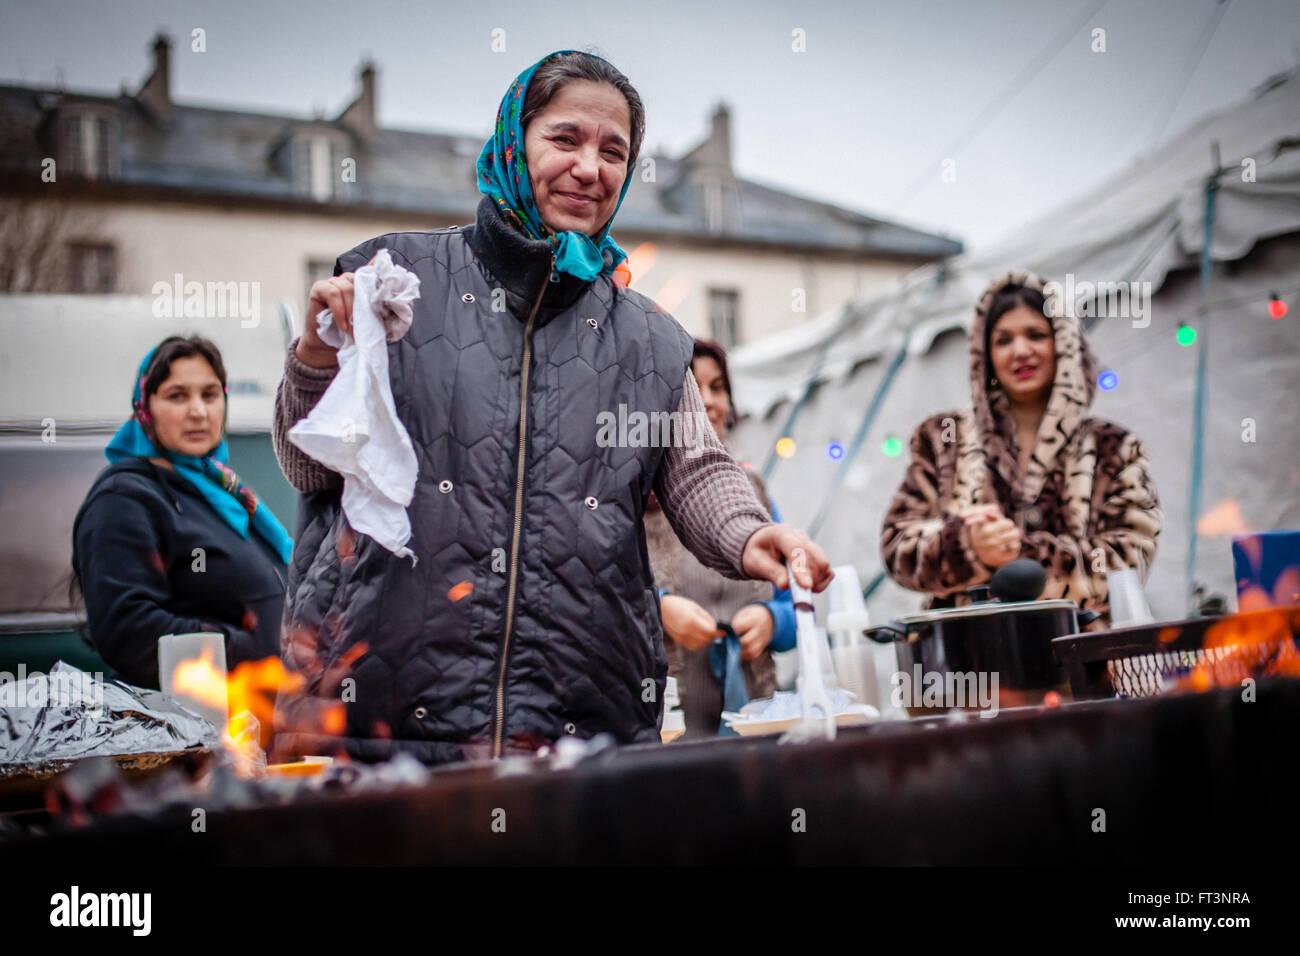 Gypsies women cooking - Stock Image